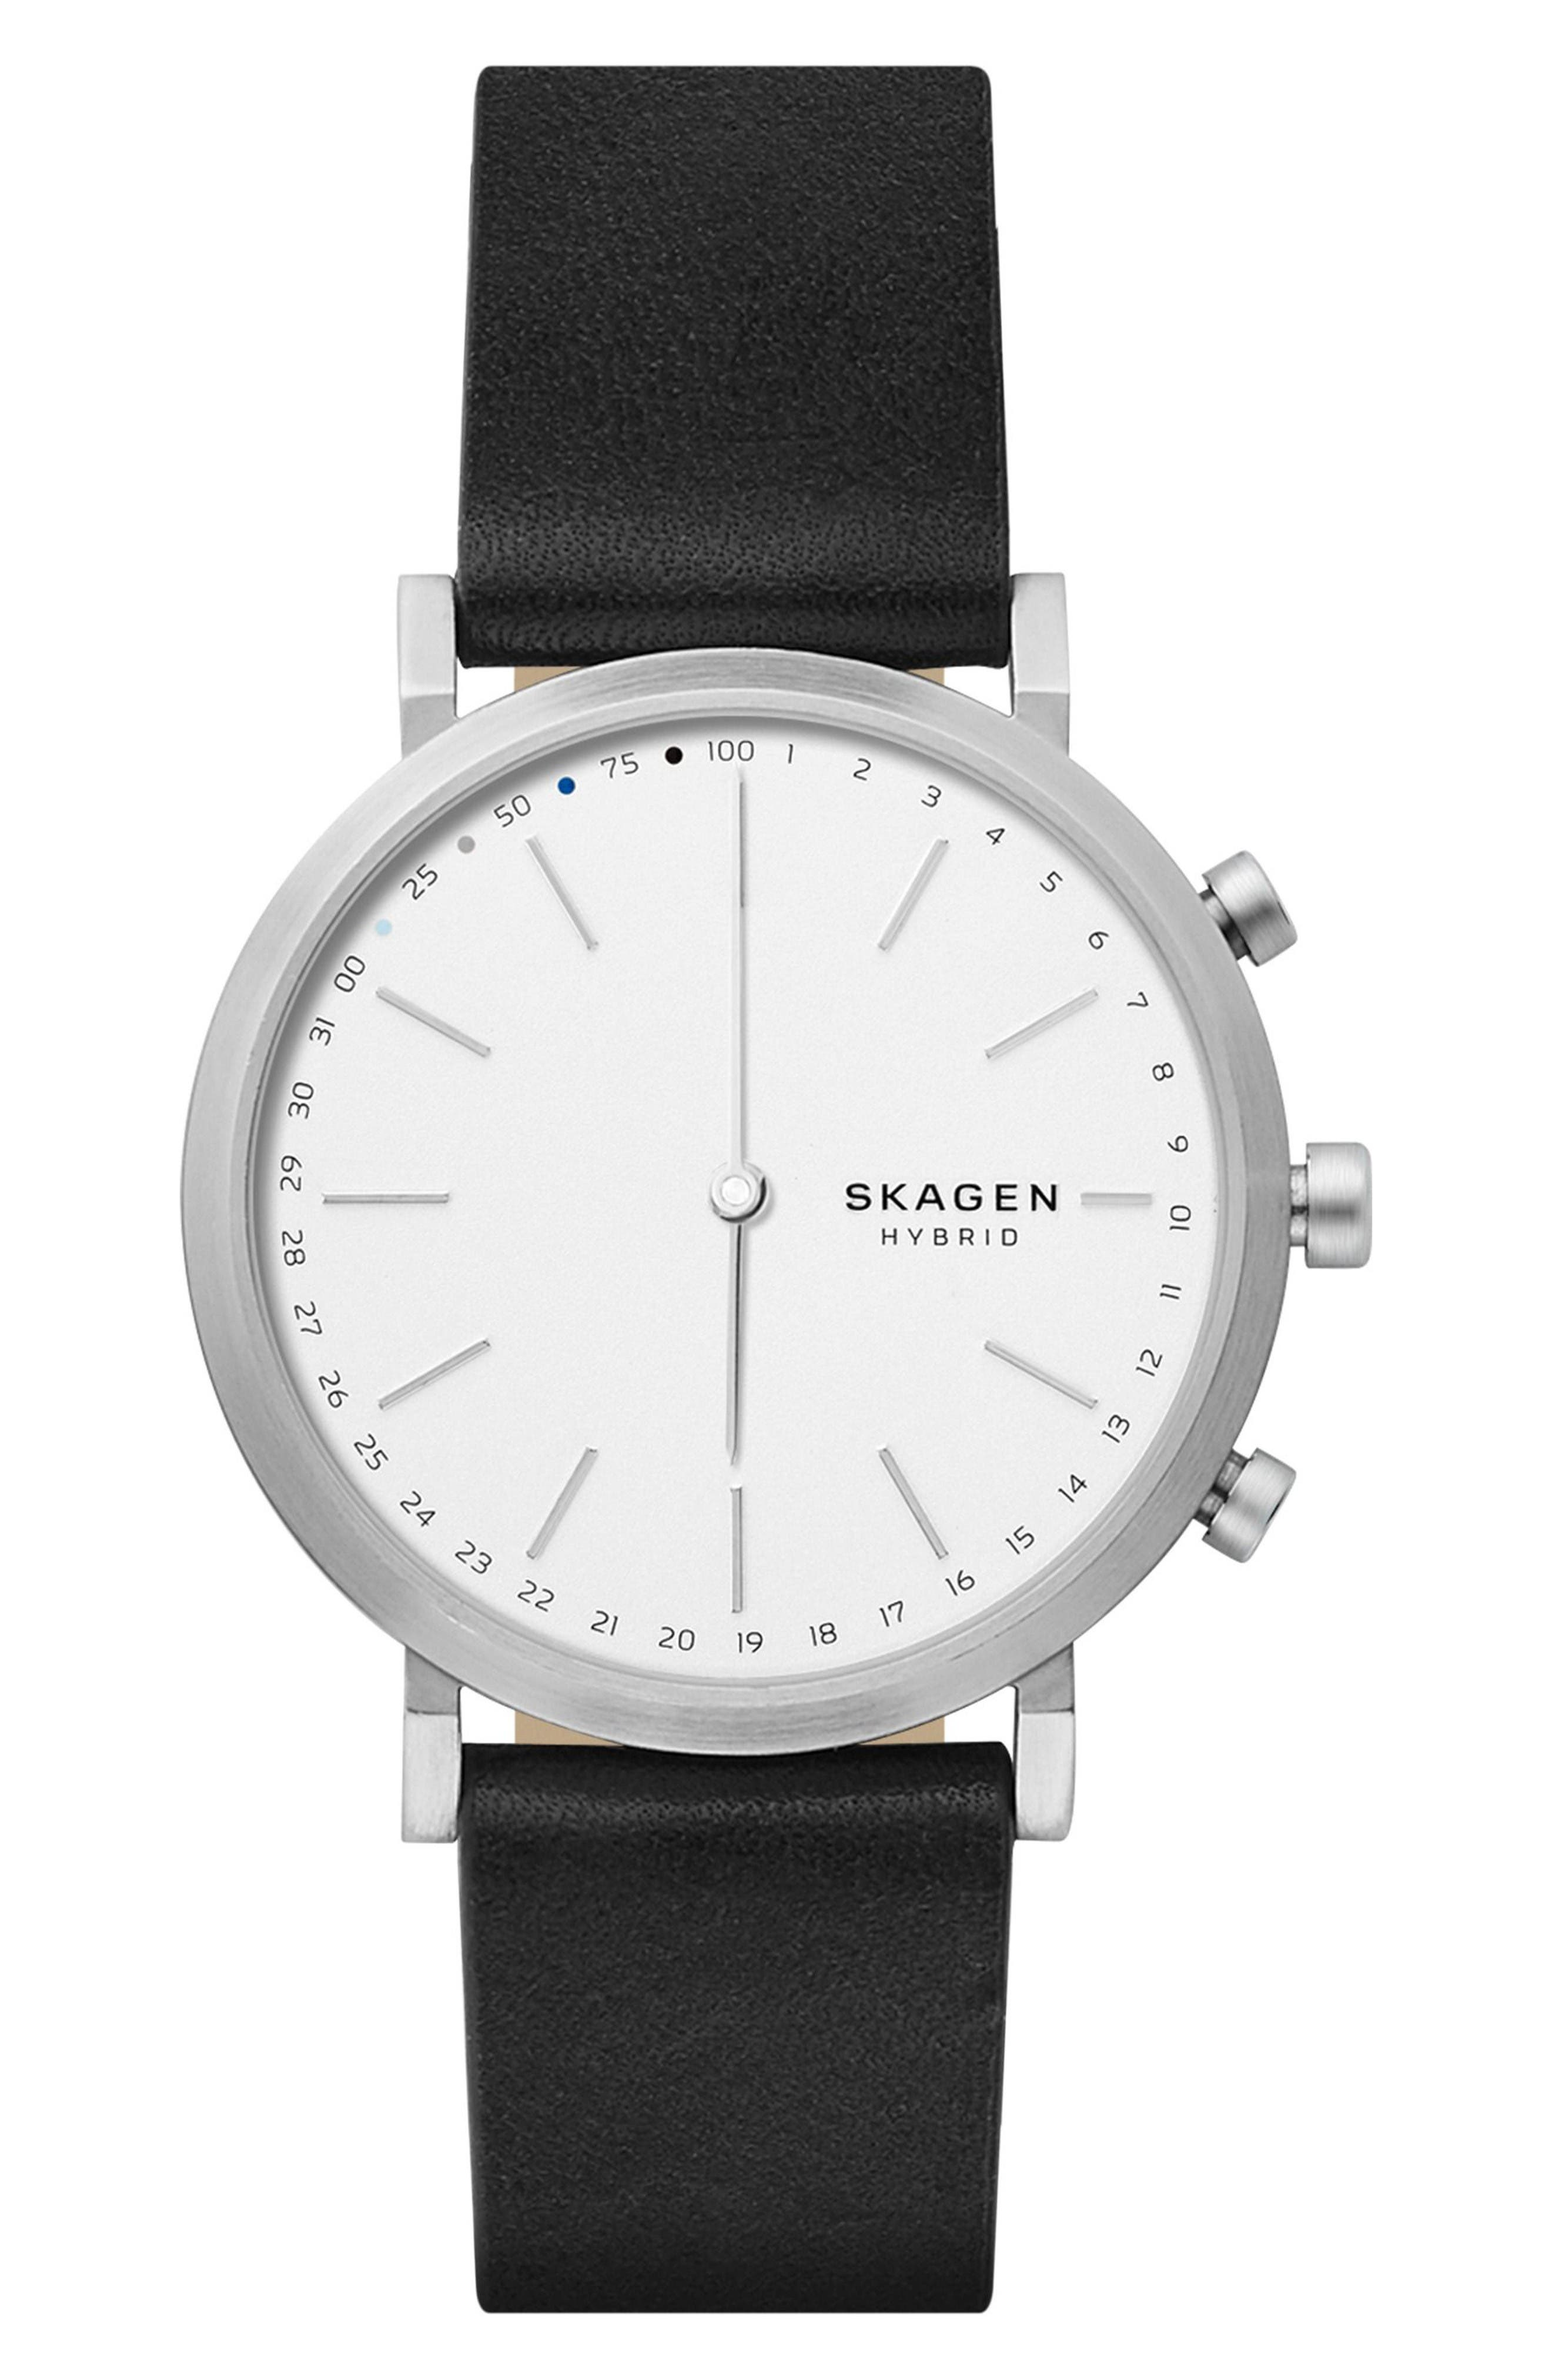 Main Image - Skagen Hald Hybrid Leather Strap Smart Watch, 40mm